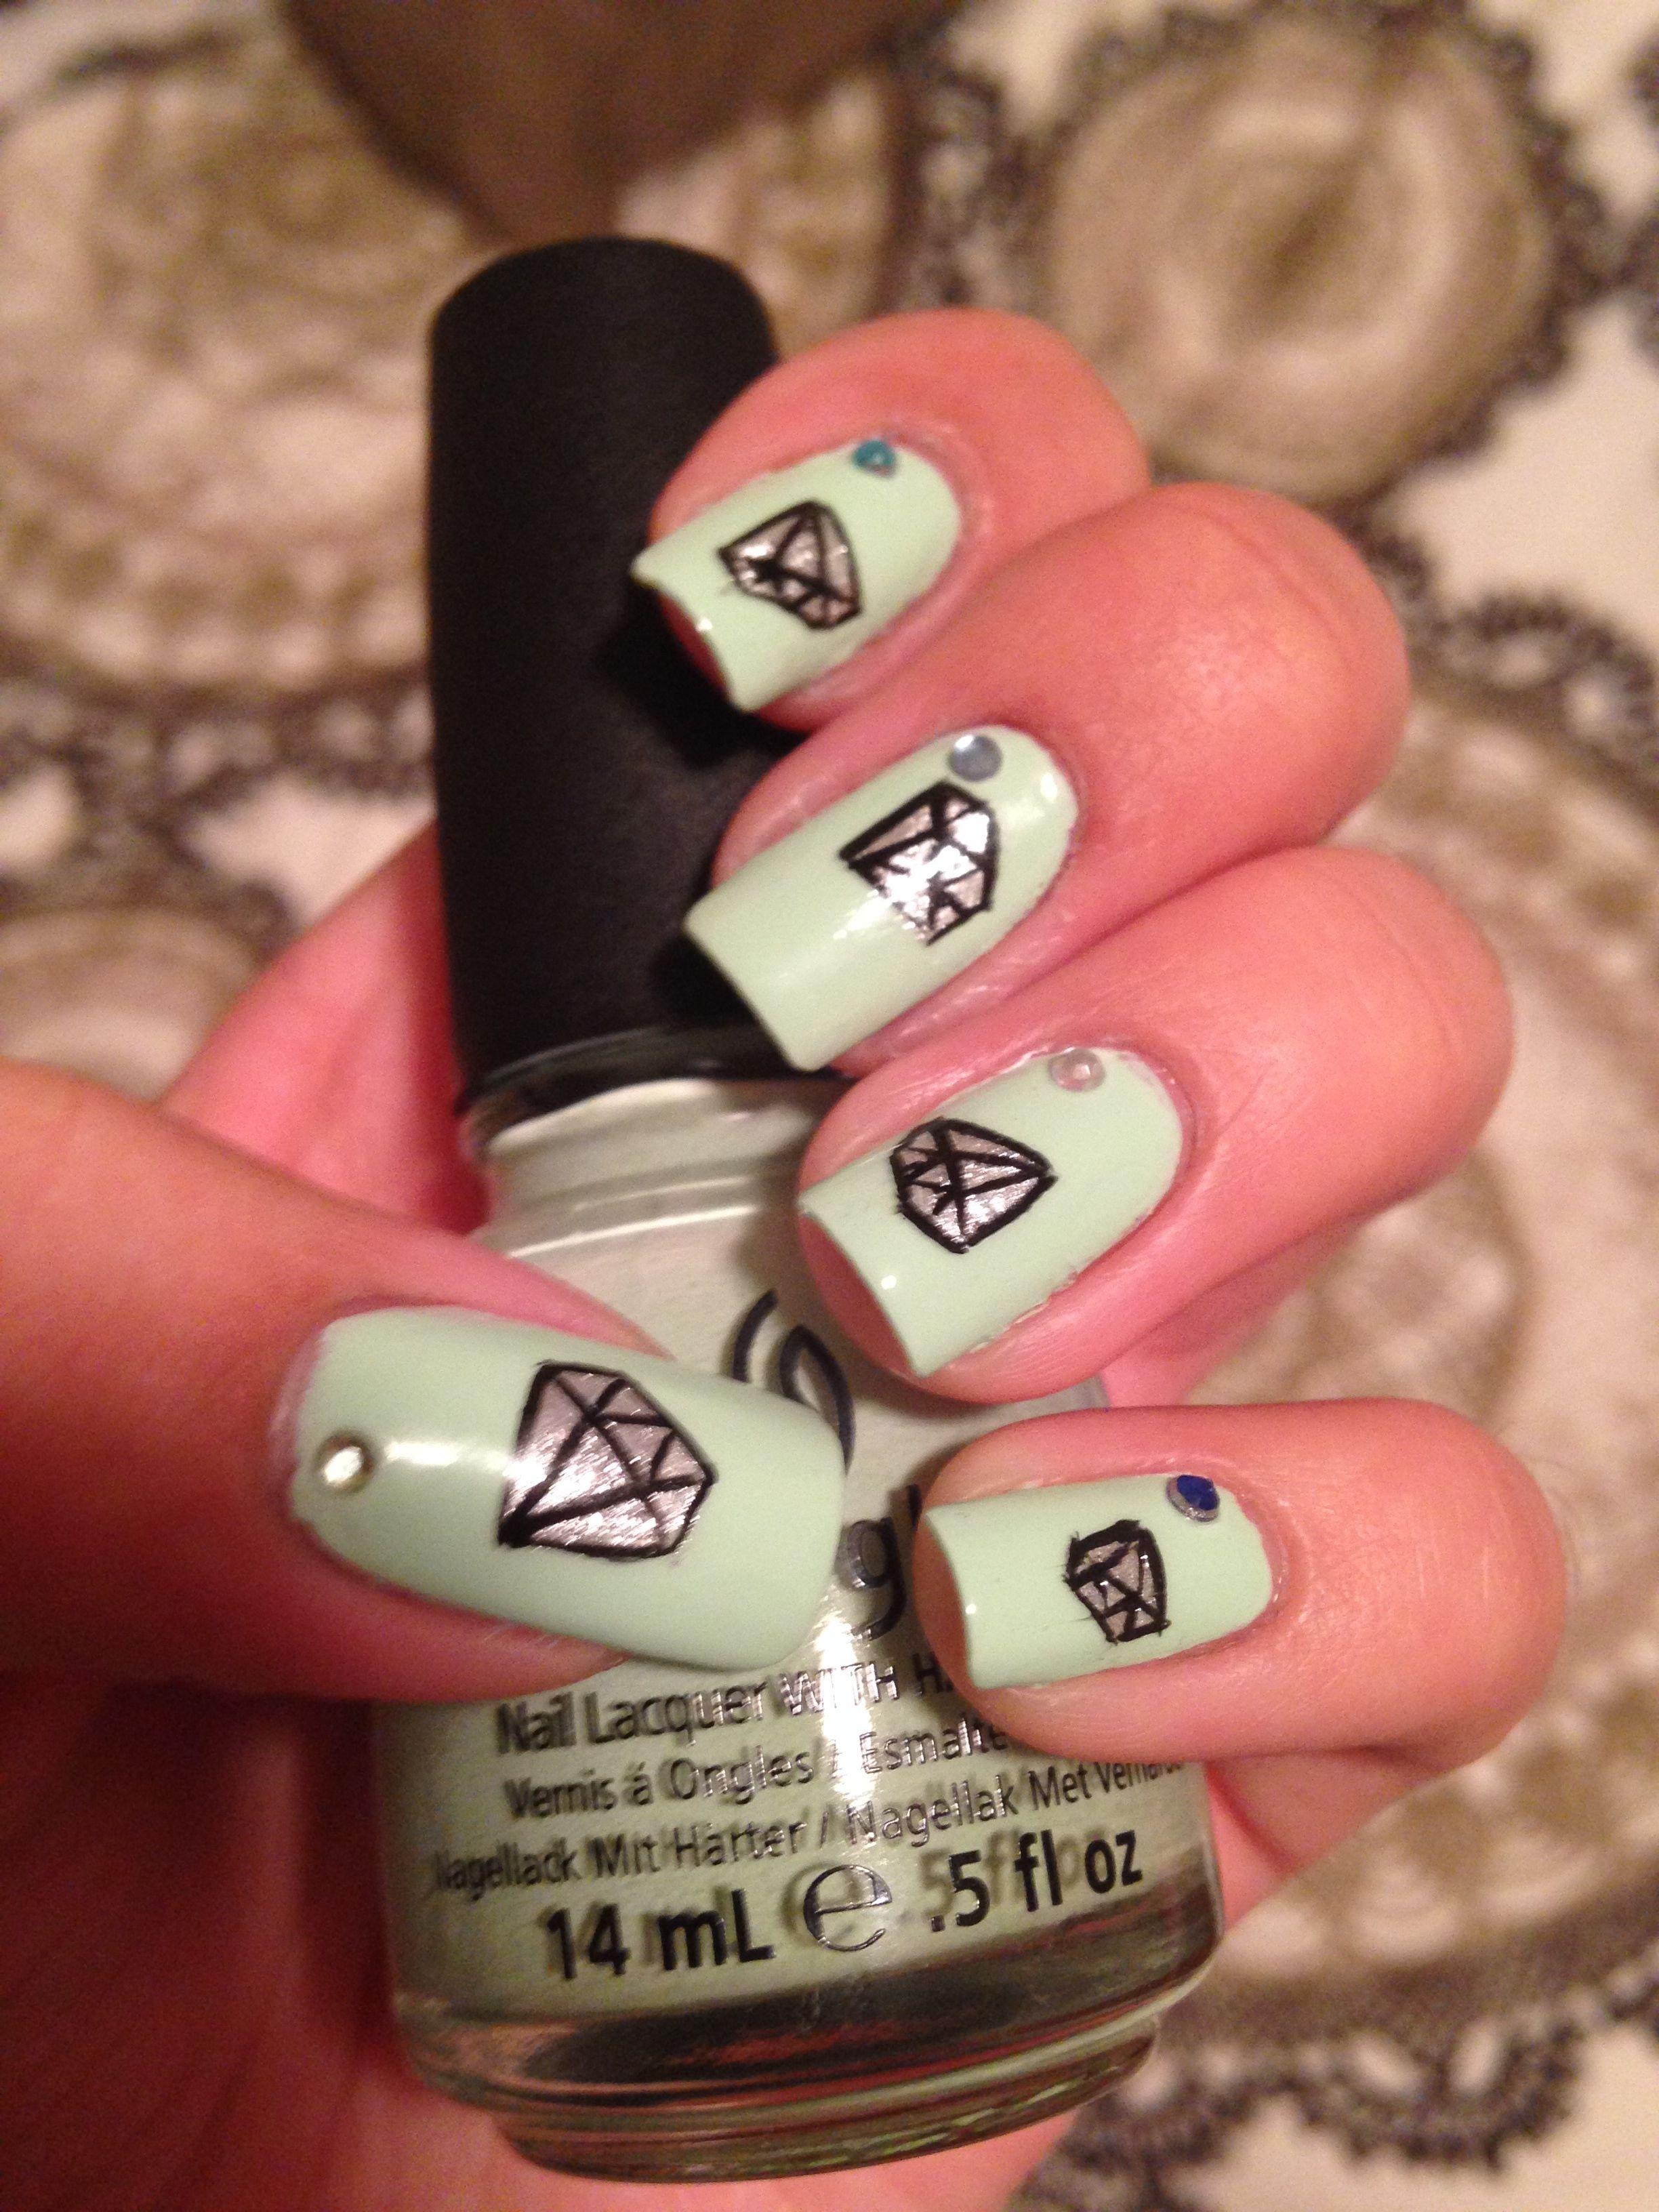 diamond nail art | My Nails | Pinterest | Diamond nail art and ...